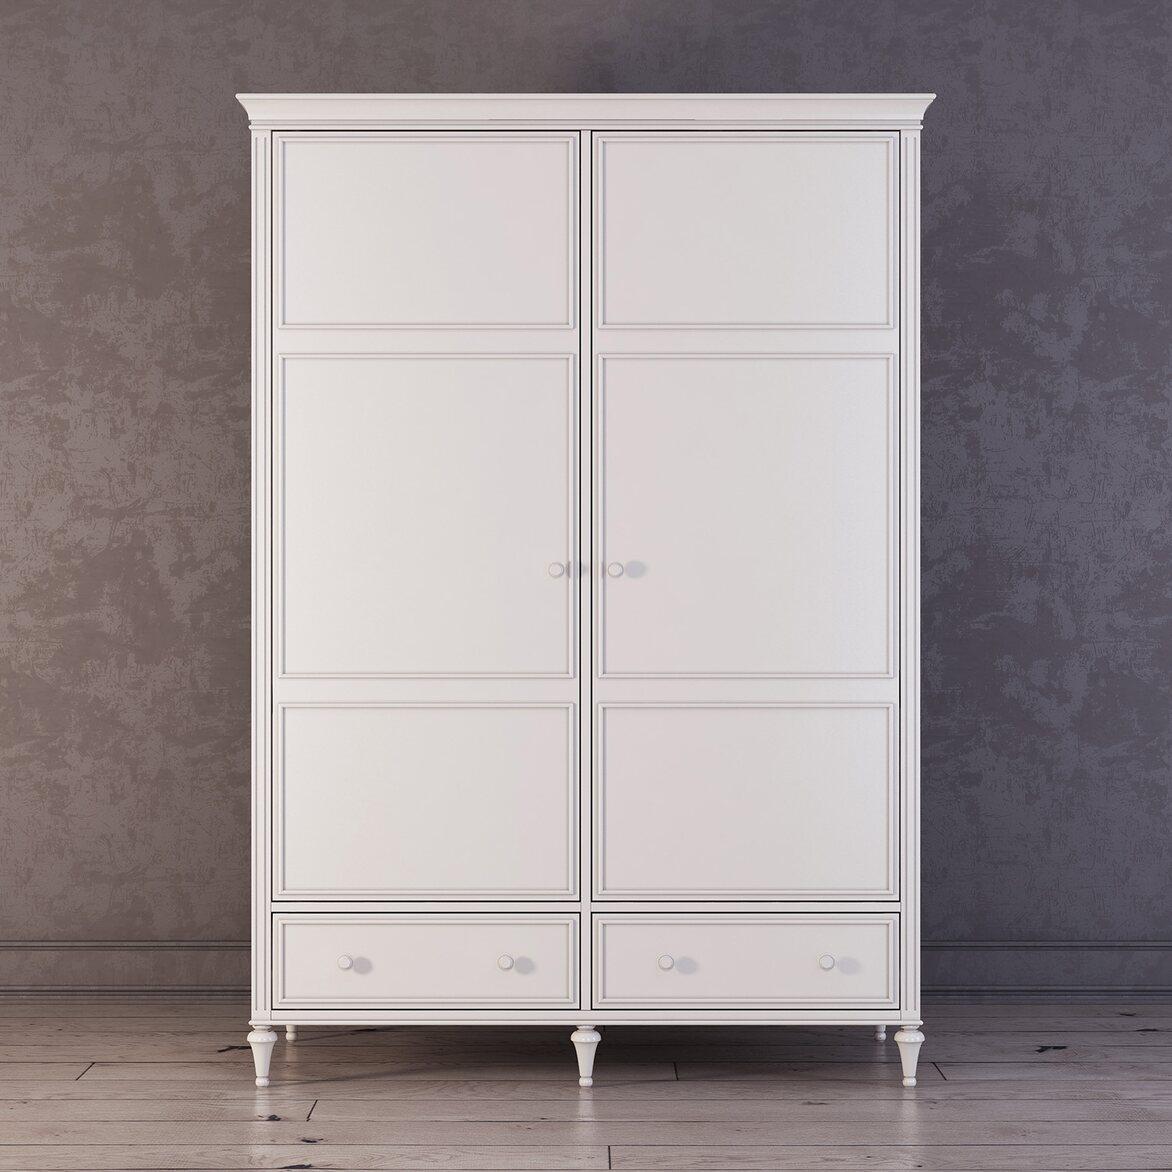 Шкаф двухстворчатый Riverdi   Платяные шкафы Kingsby